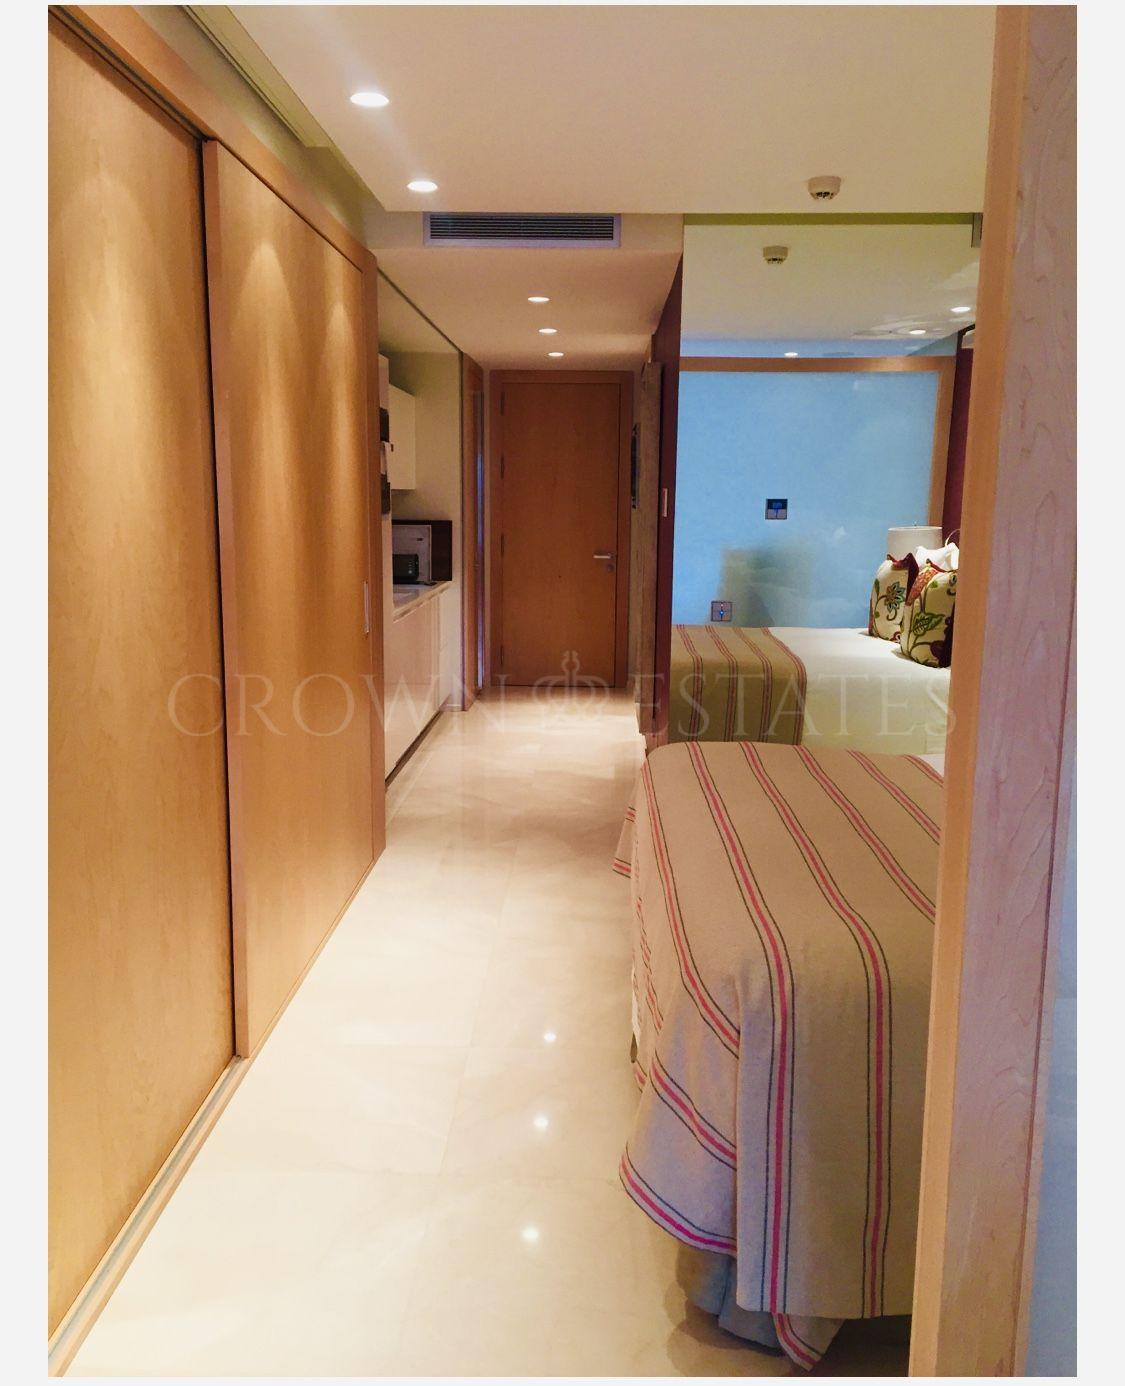 Cozy studio apartment in the best location of Golden Mile,Marbella